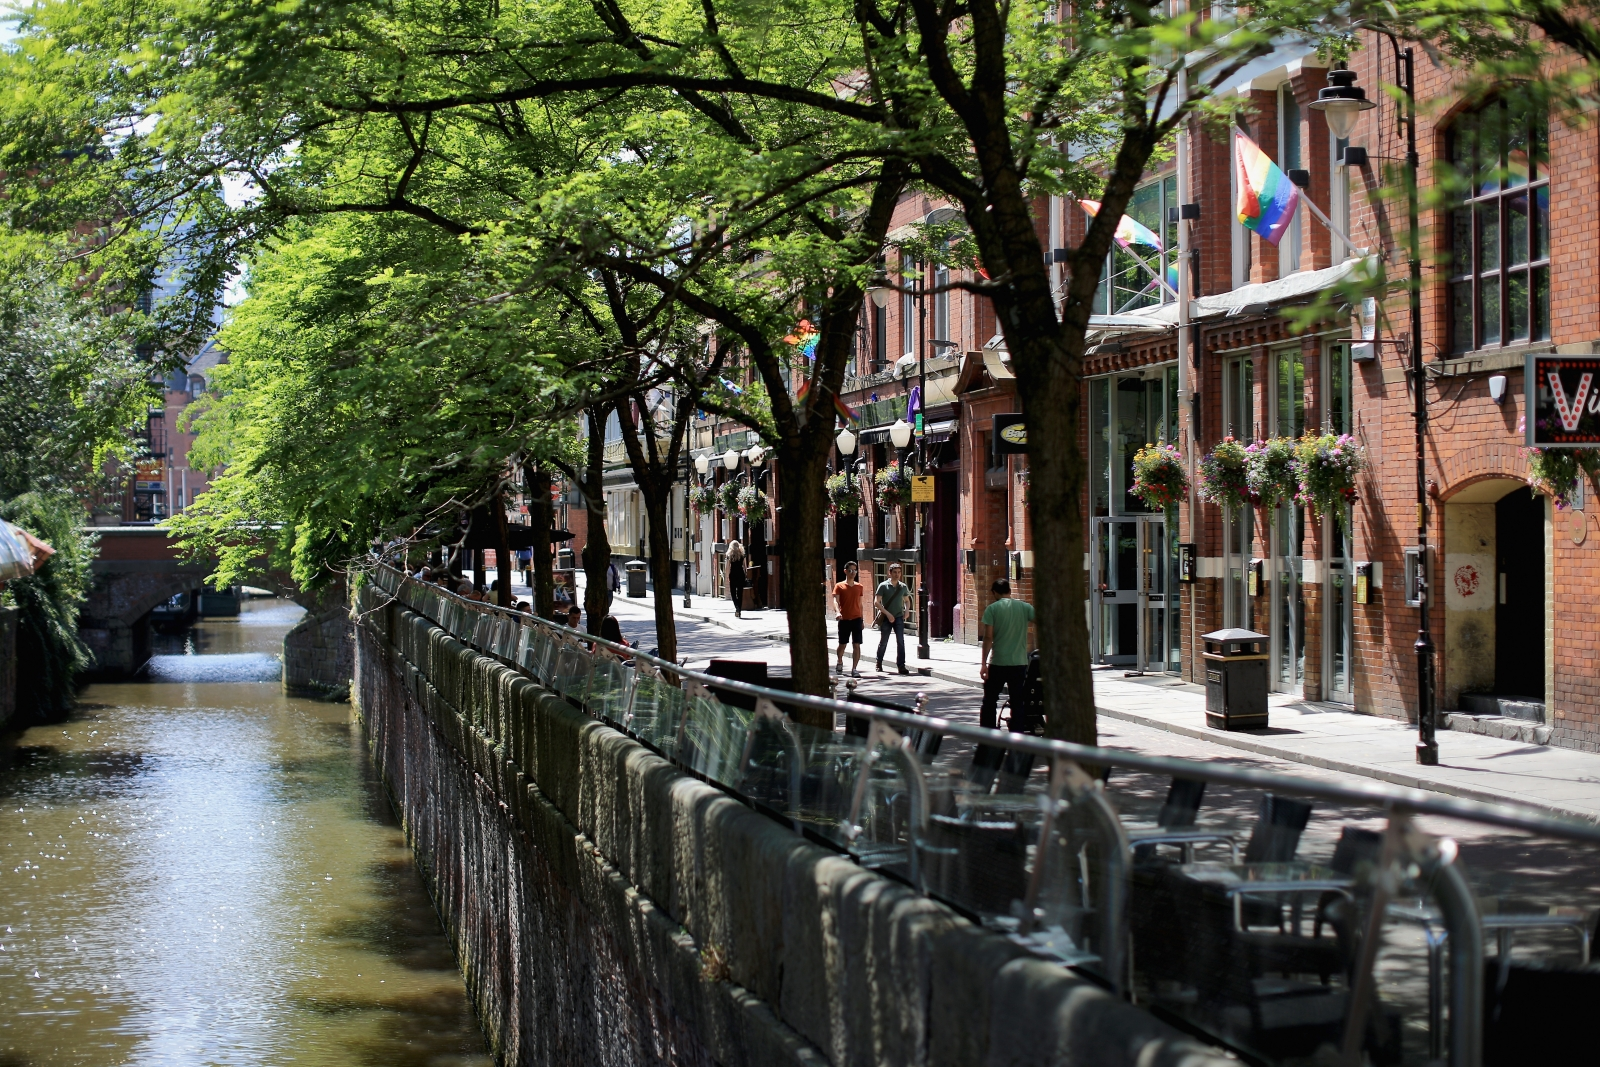 Canal gratification